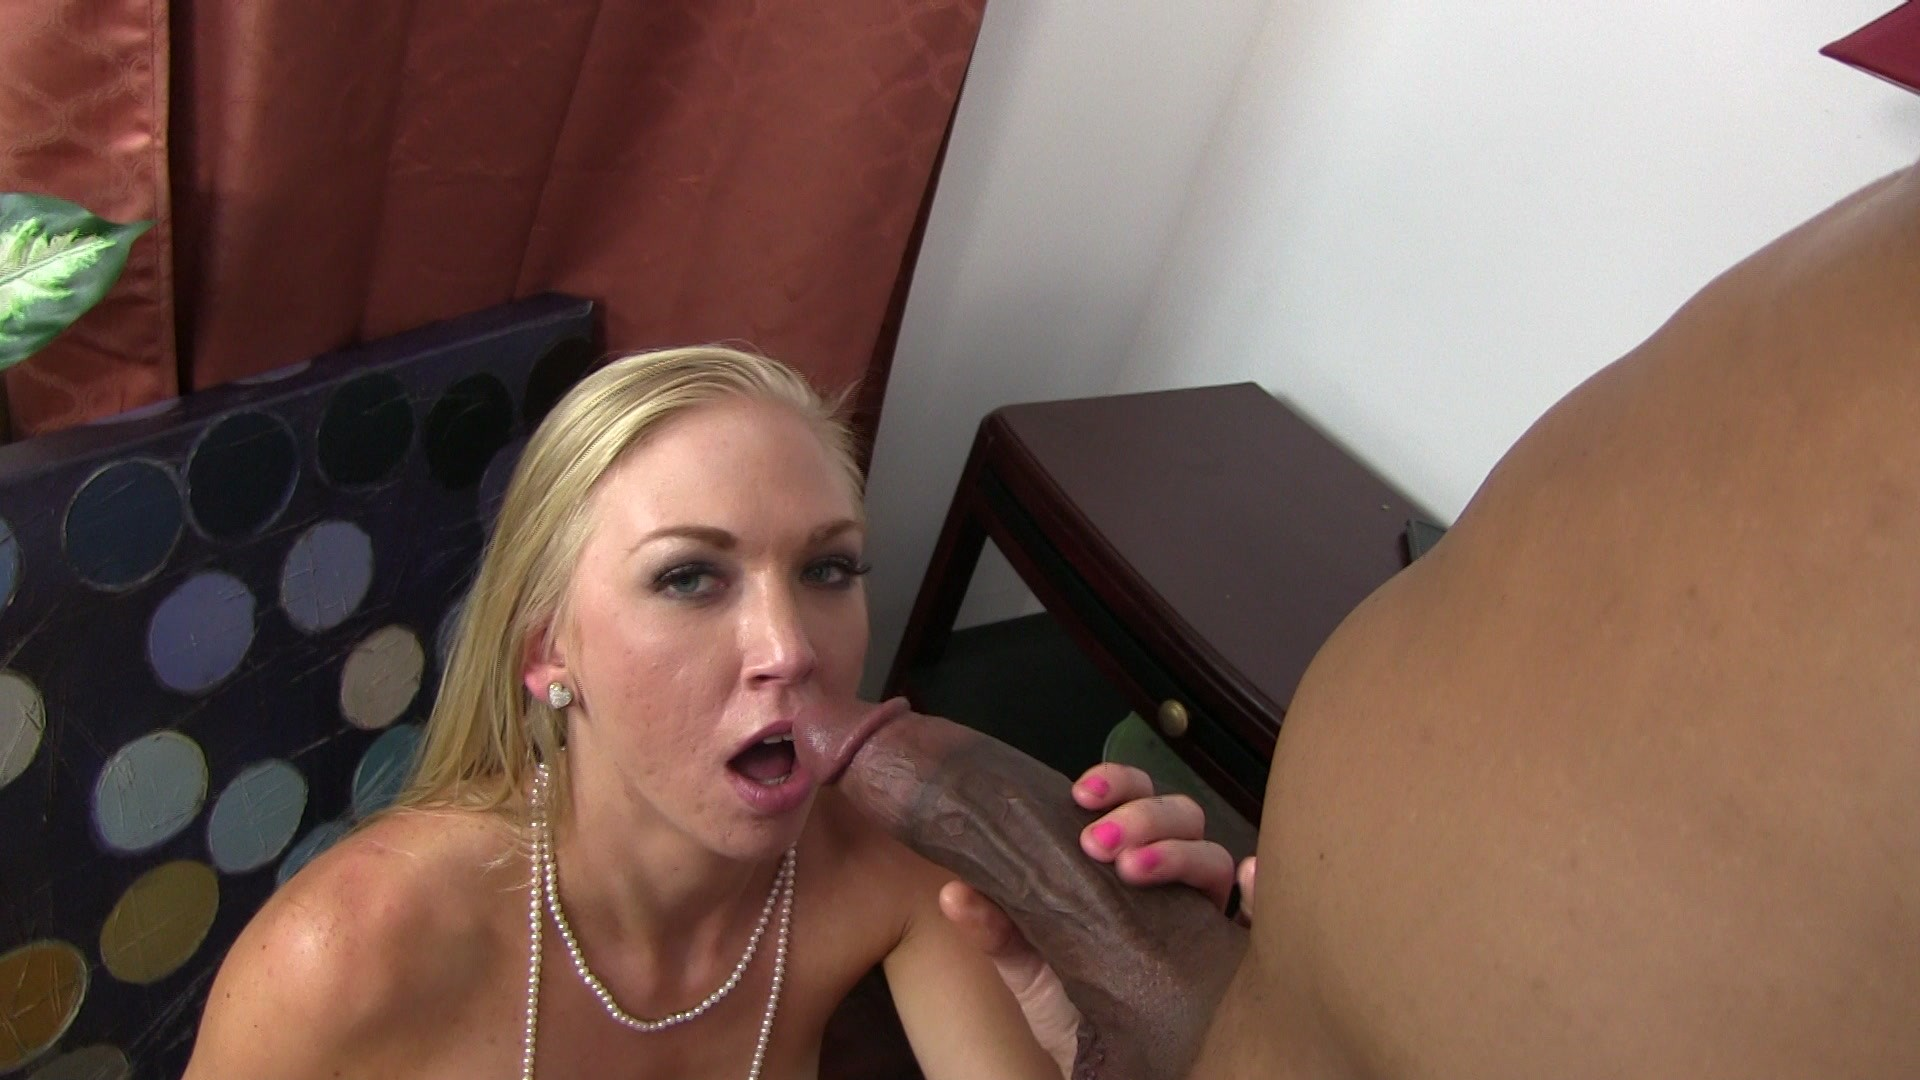 Porn photos with black boys with white sexy girls